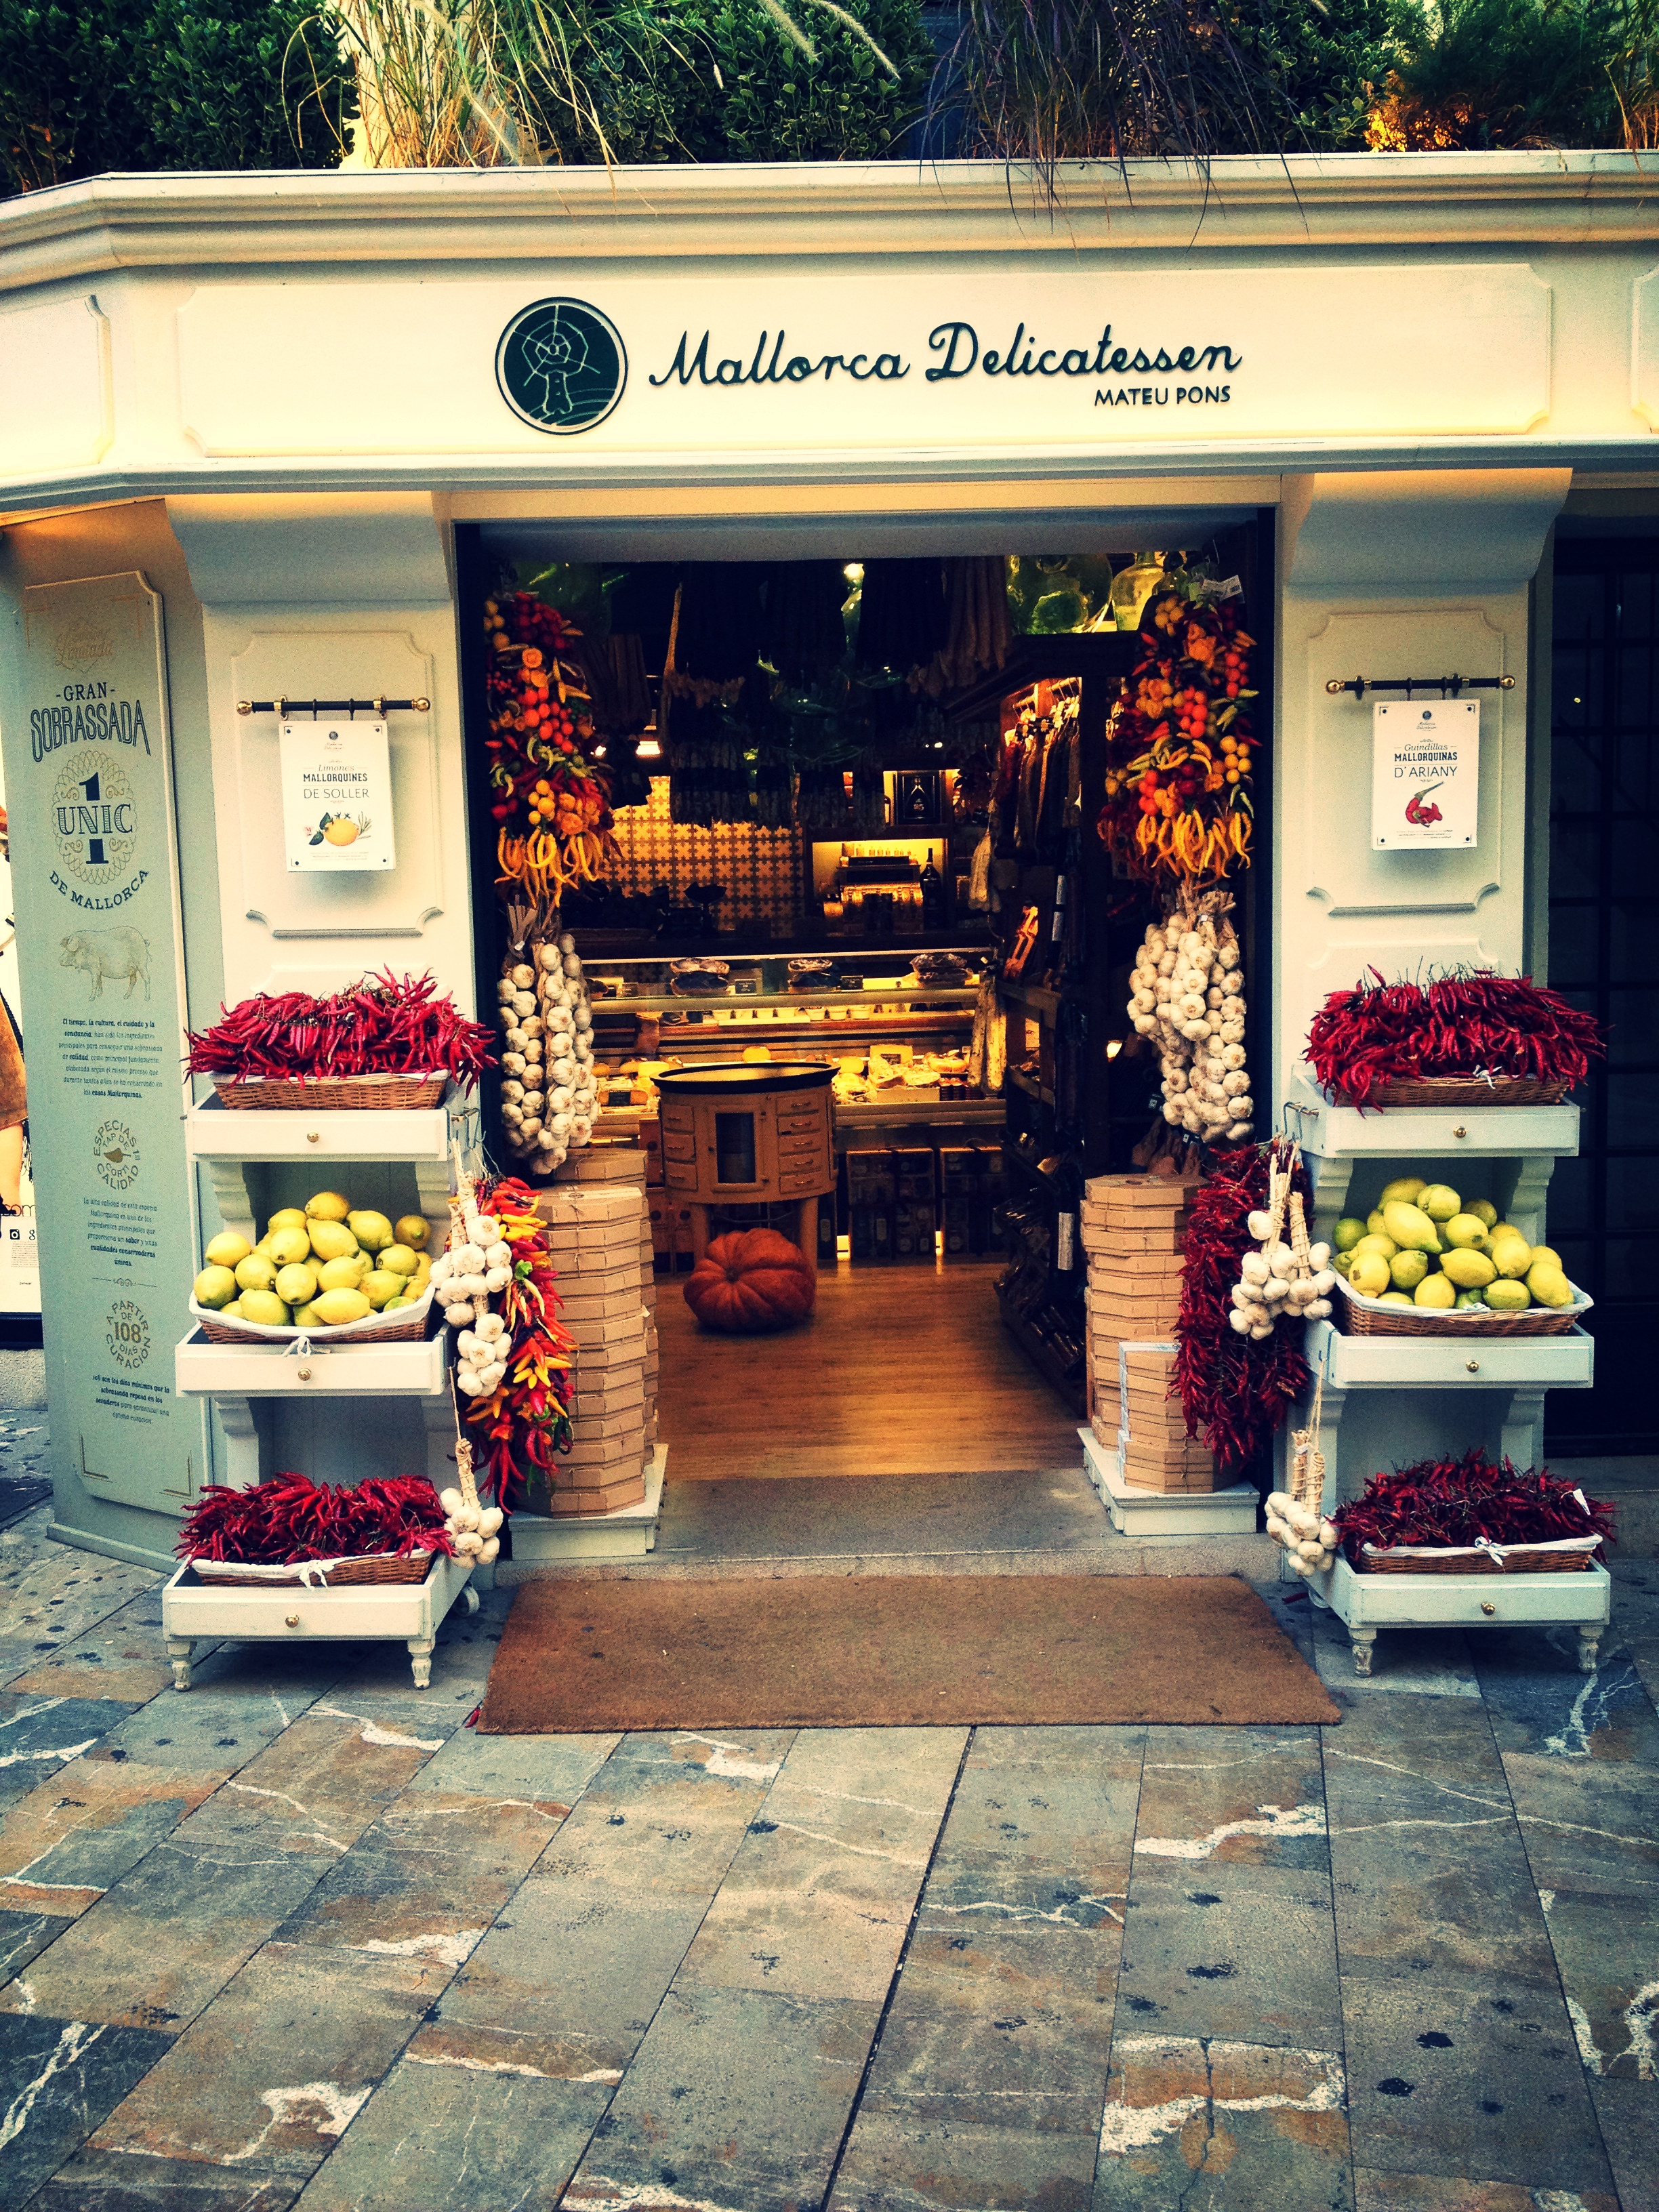 Dating byrå Mallorca